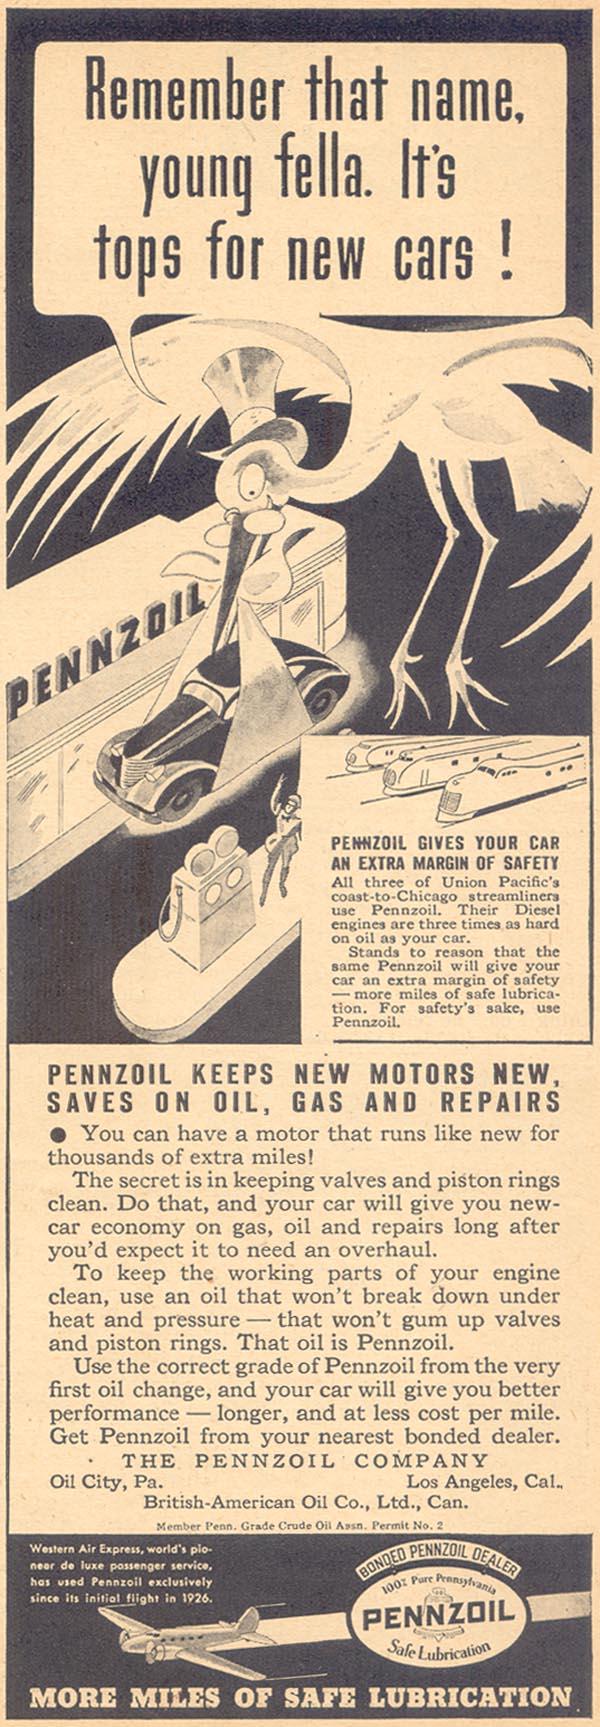 PENNZOIL MOTOR OIL LIBERTY 11/28/1936 p. 39